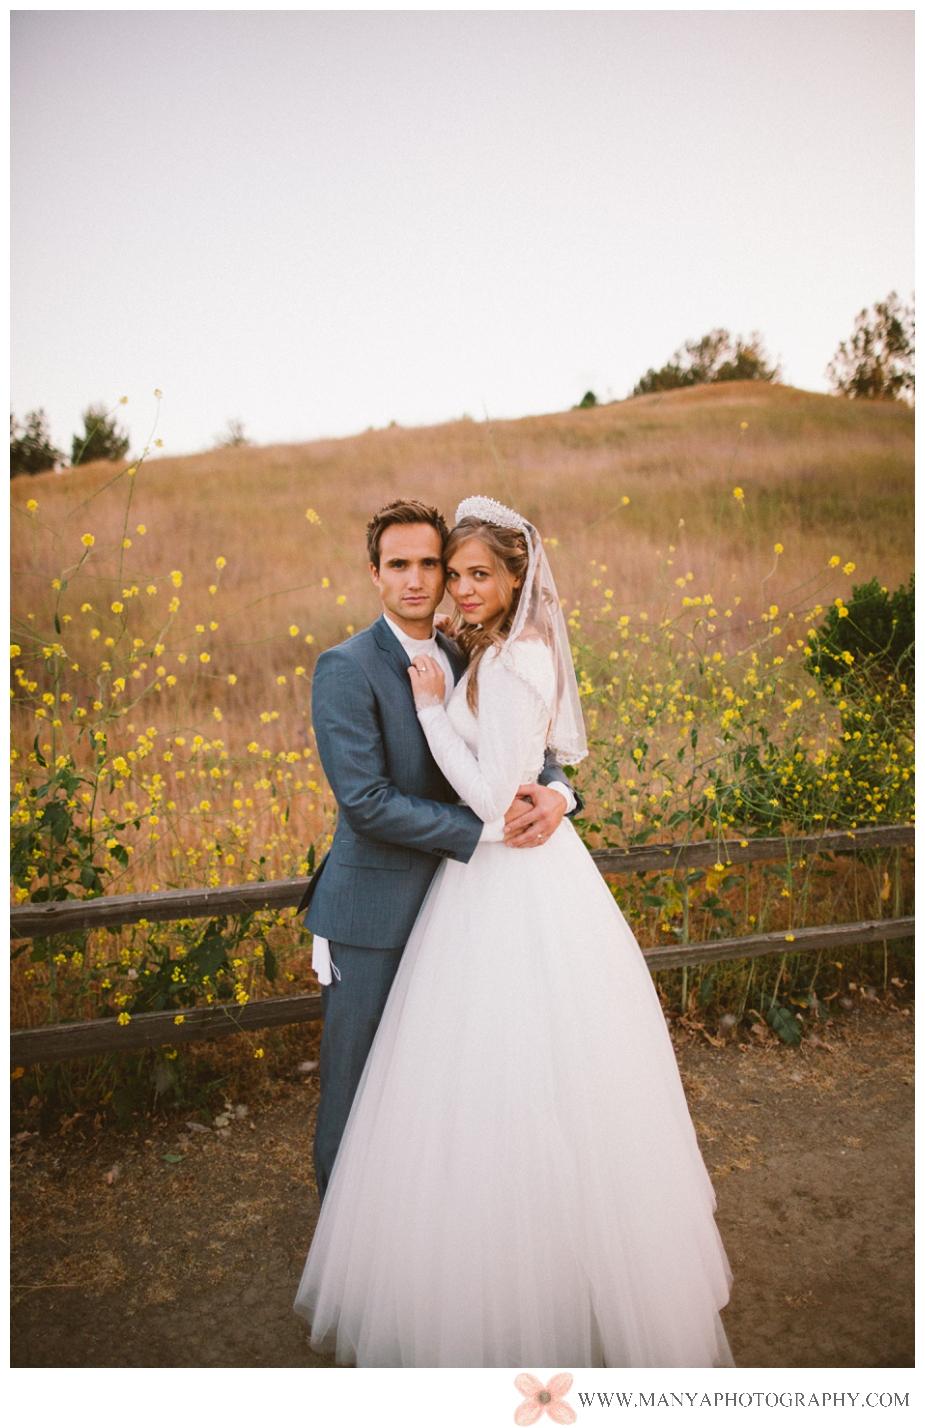 2013-07-23_0025 - Orange County Wedding Photographer